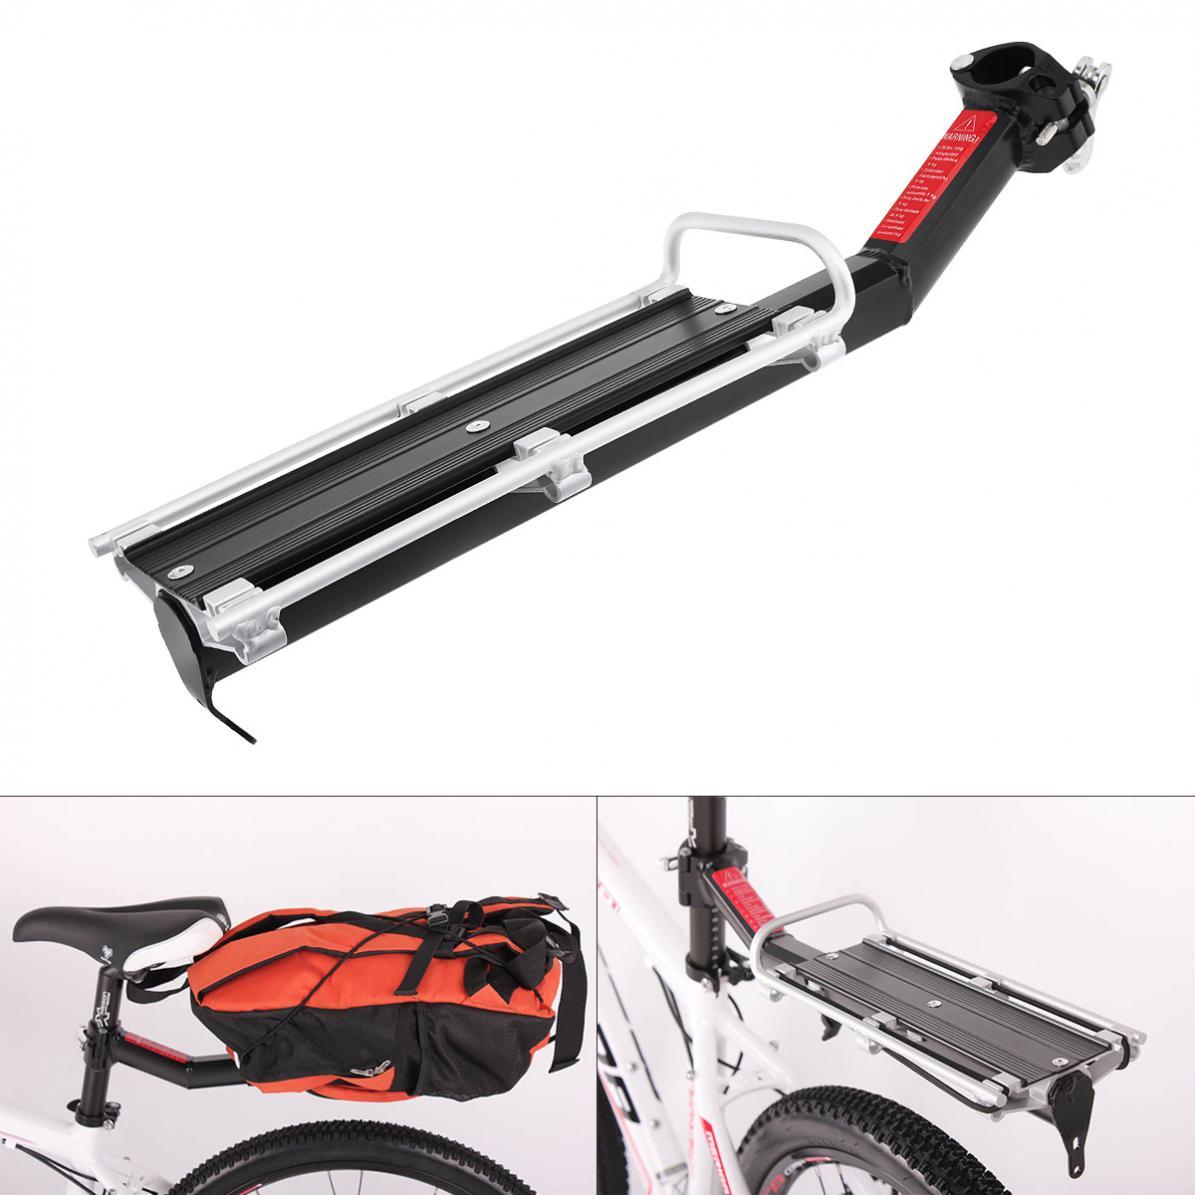 Preto rack de bicicleta liga alumínio bagagem traseiro tronco portador para bicicletas mtb bicicleta prateleira traseira ciclismo cremalheiras